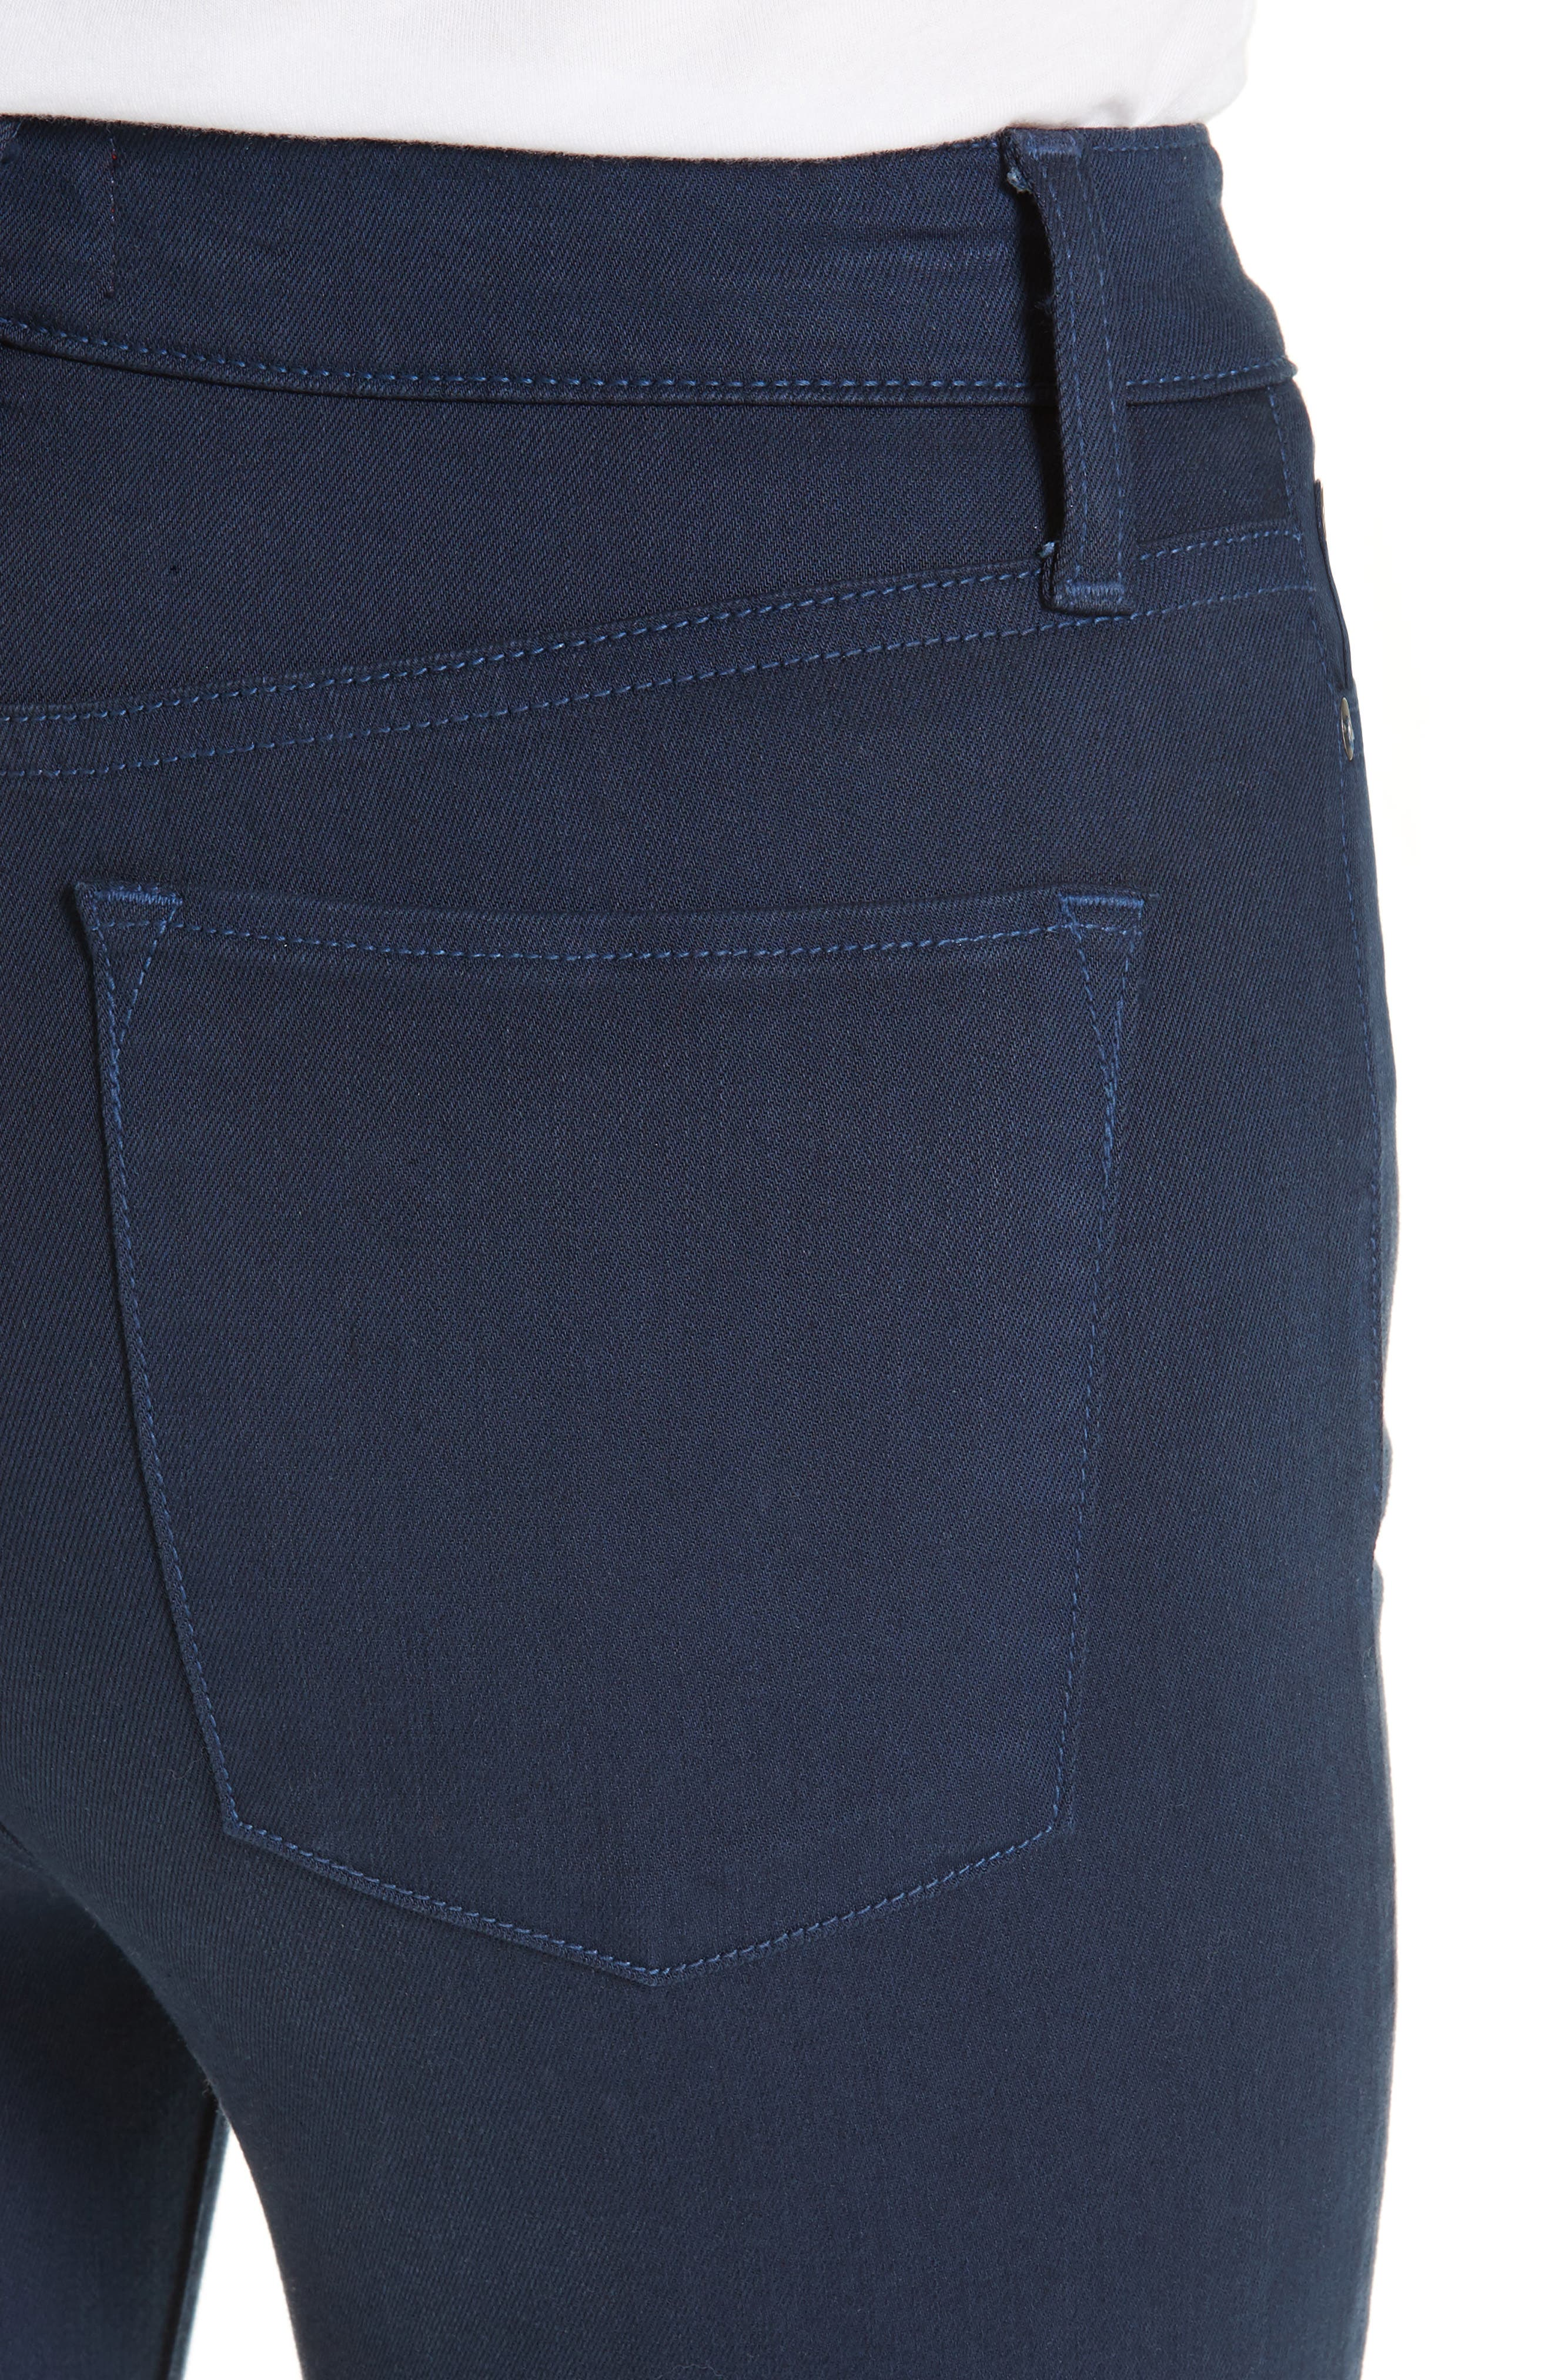 Good High Waist Skinny Jeans,                             Alternate thumbnail 4, color,                             400